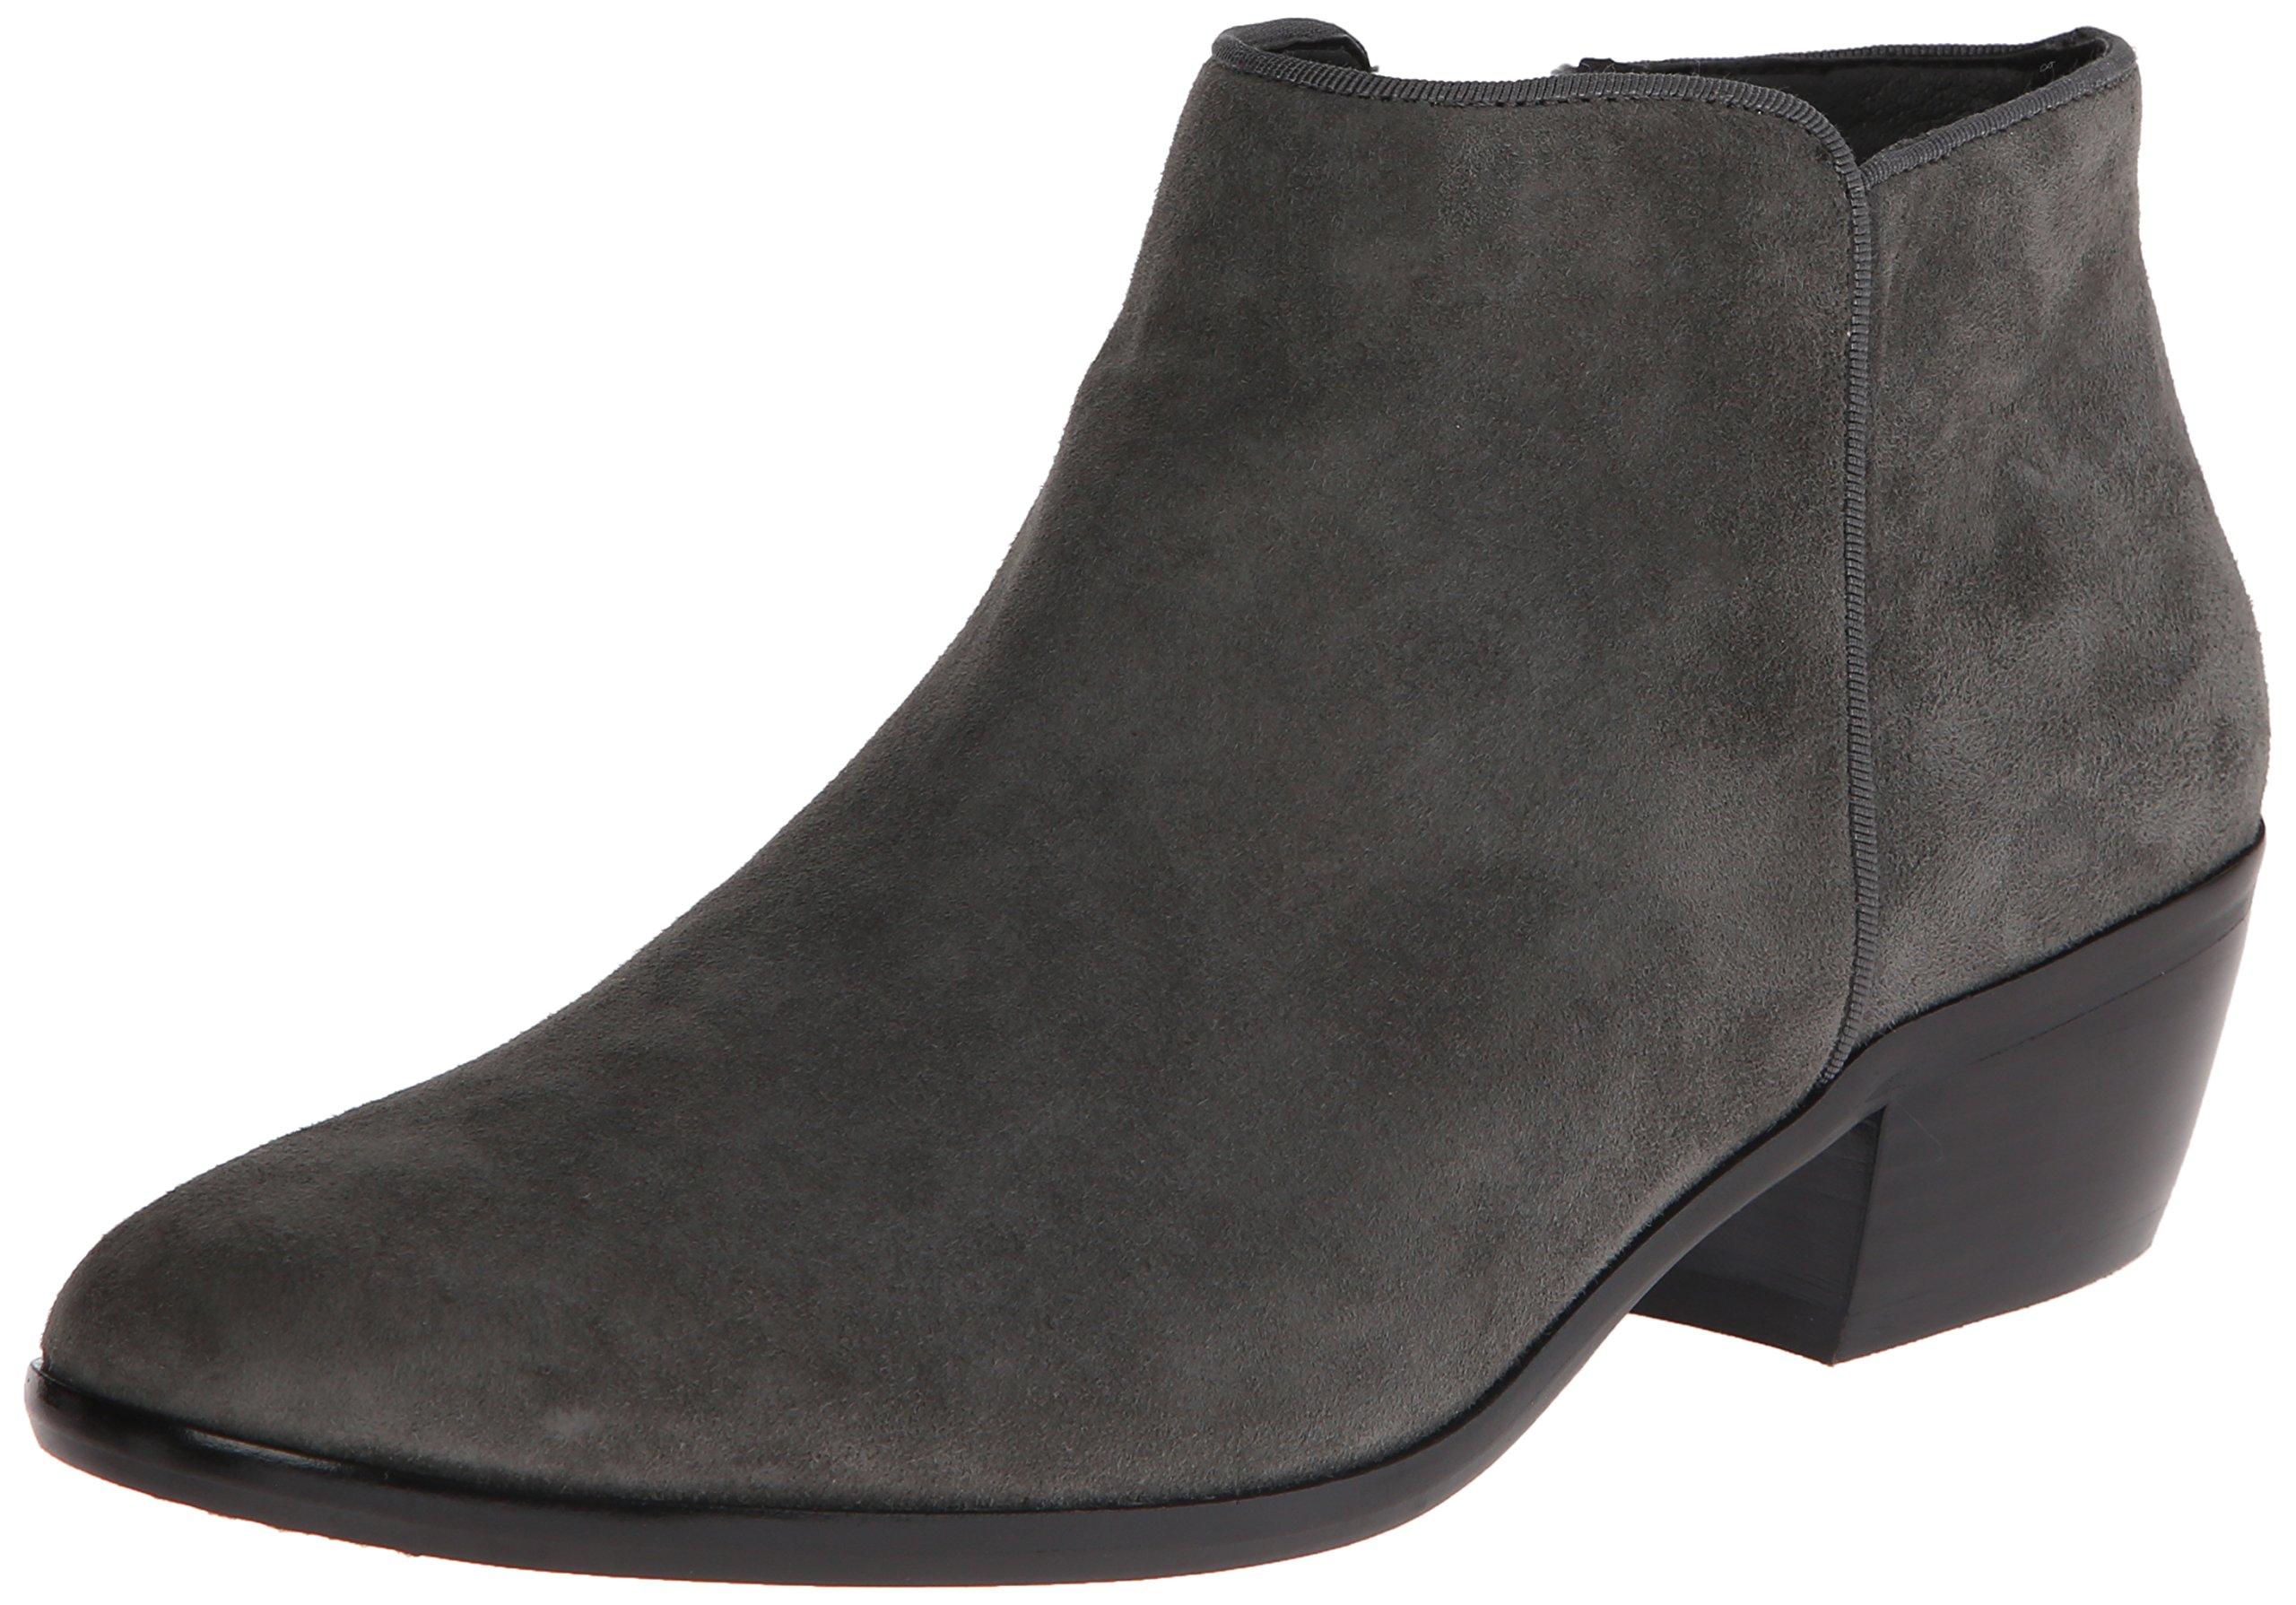 Sam Edelman Women's Petty Boot, Slate Grey, 7.5 M US